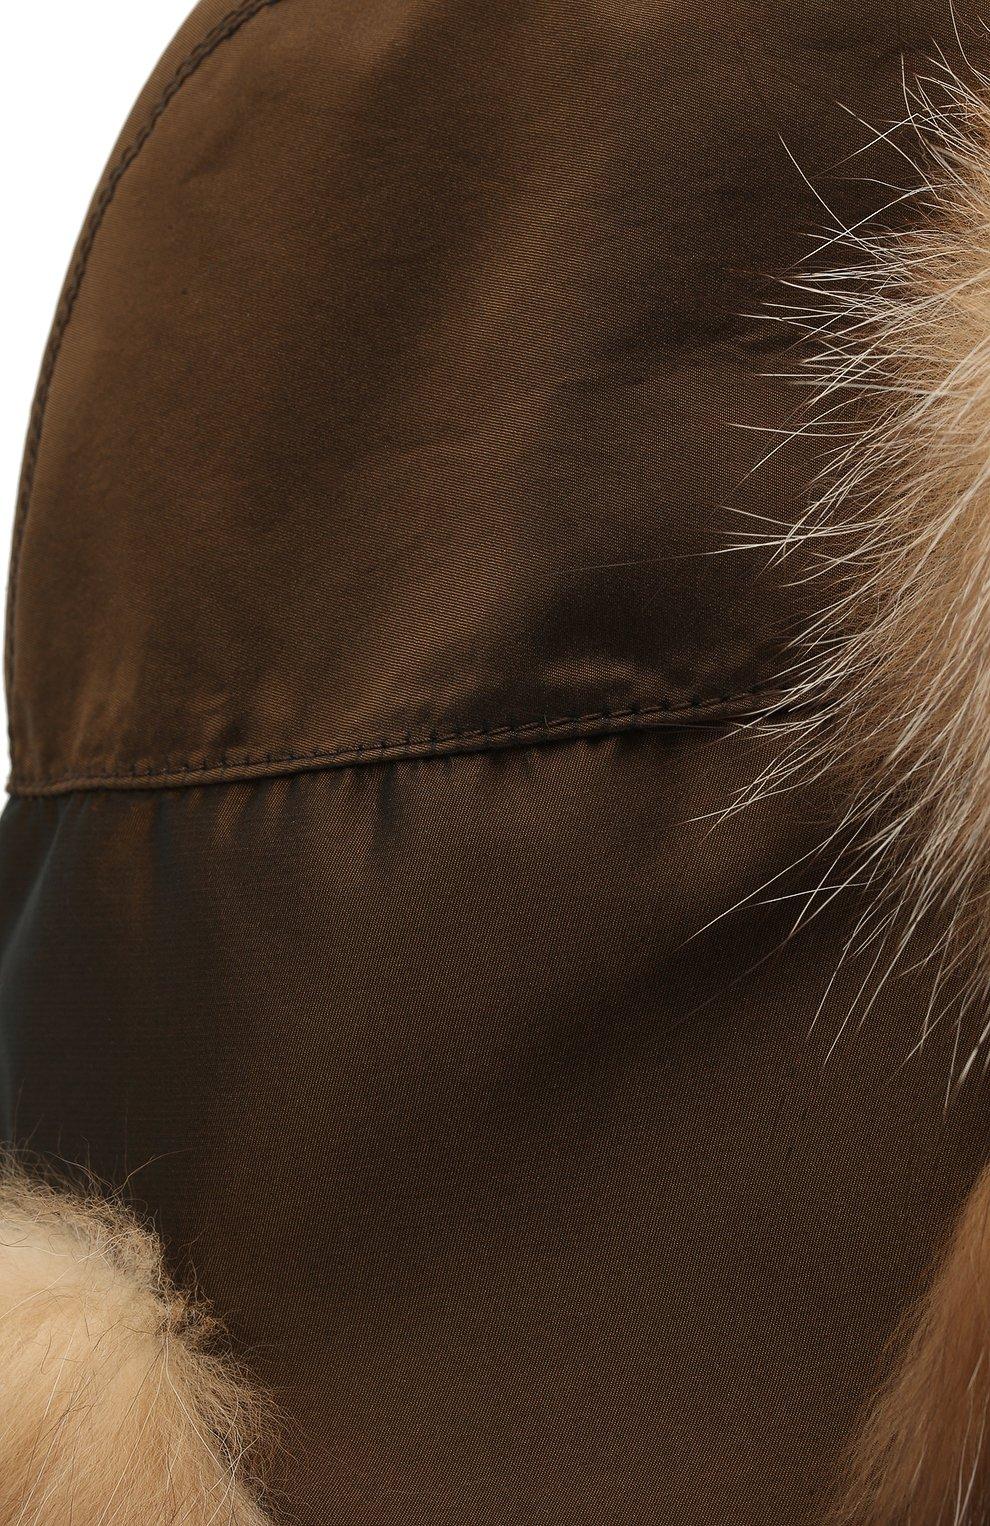 Мужская шапка-ушанка из меха лисы KUSSENKOVV коричневого цвета, арт. 339005603159   Фото 3